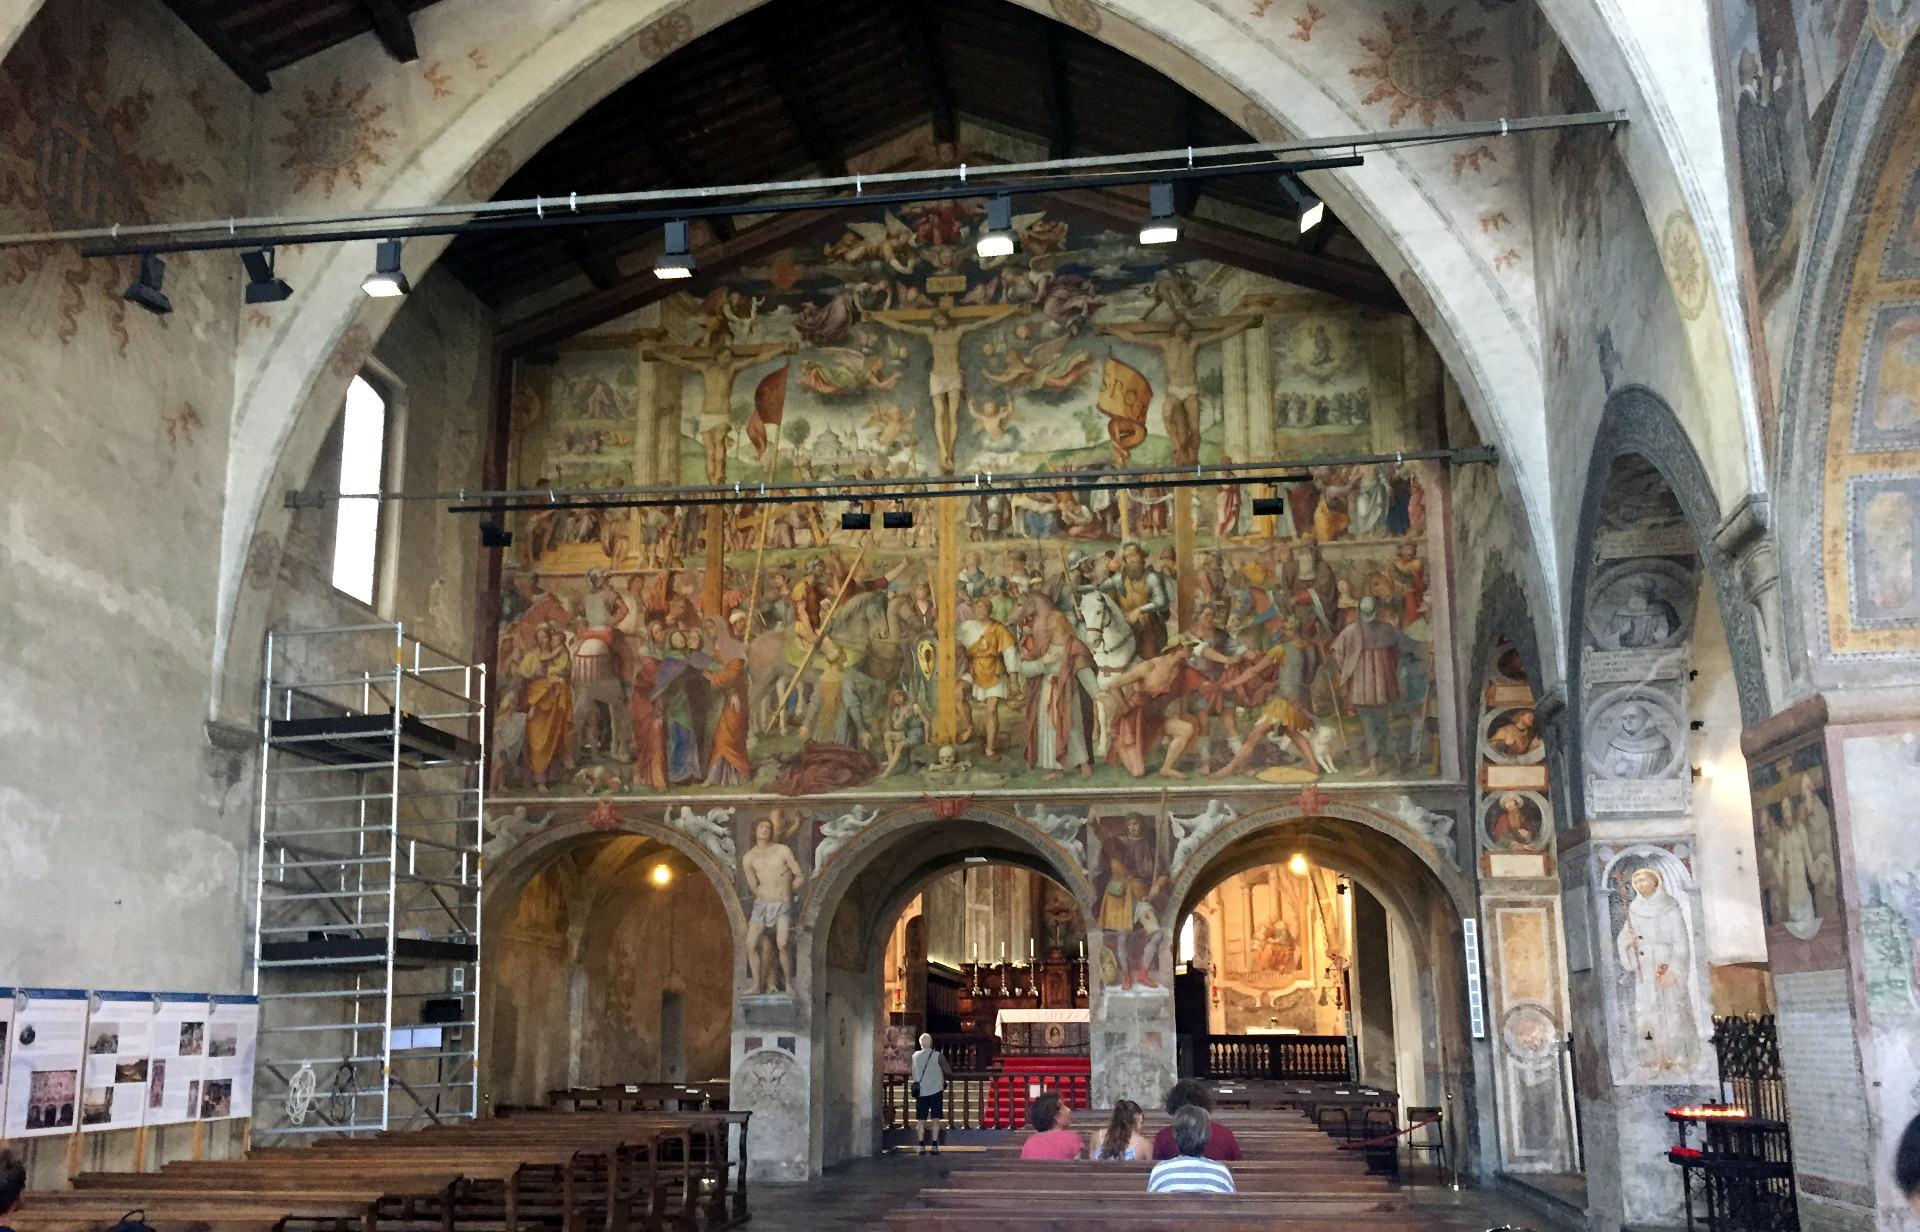 szwajcaria lugano kosciollugano chiesadisantamariadegliangeli freski budowlasakralnalugano luganoszwajcaria iglawpodrozy